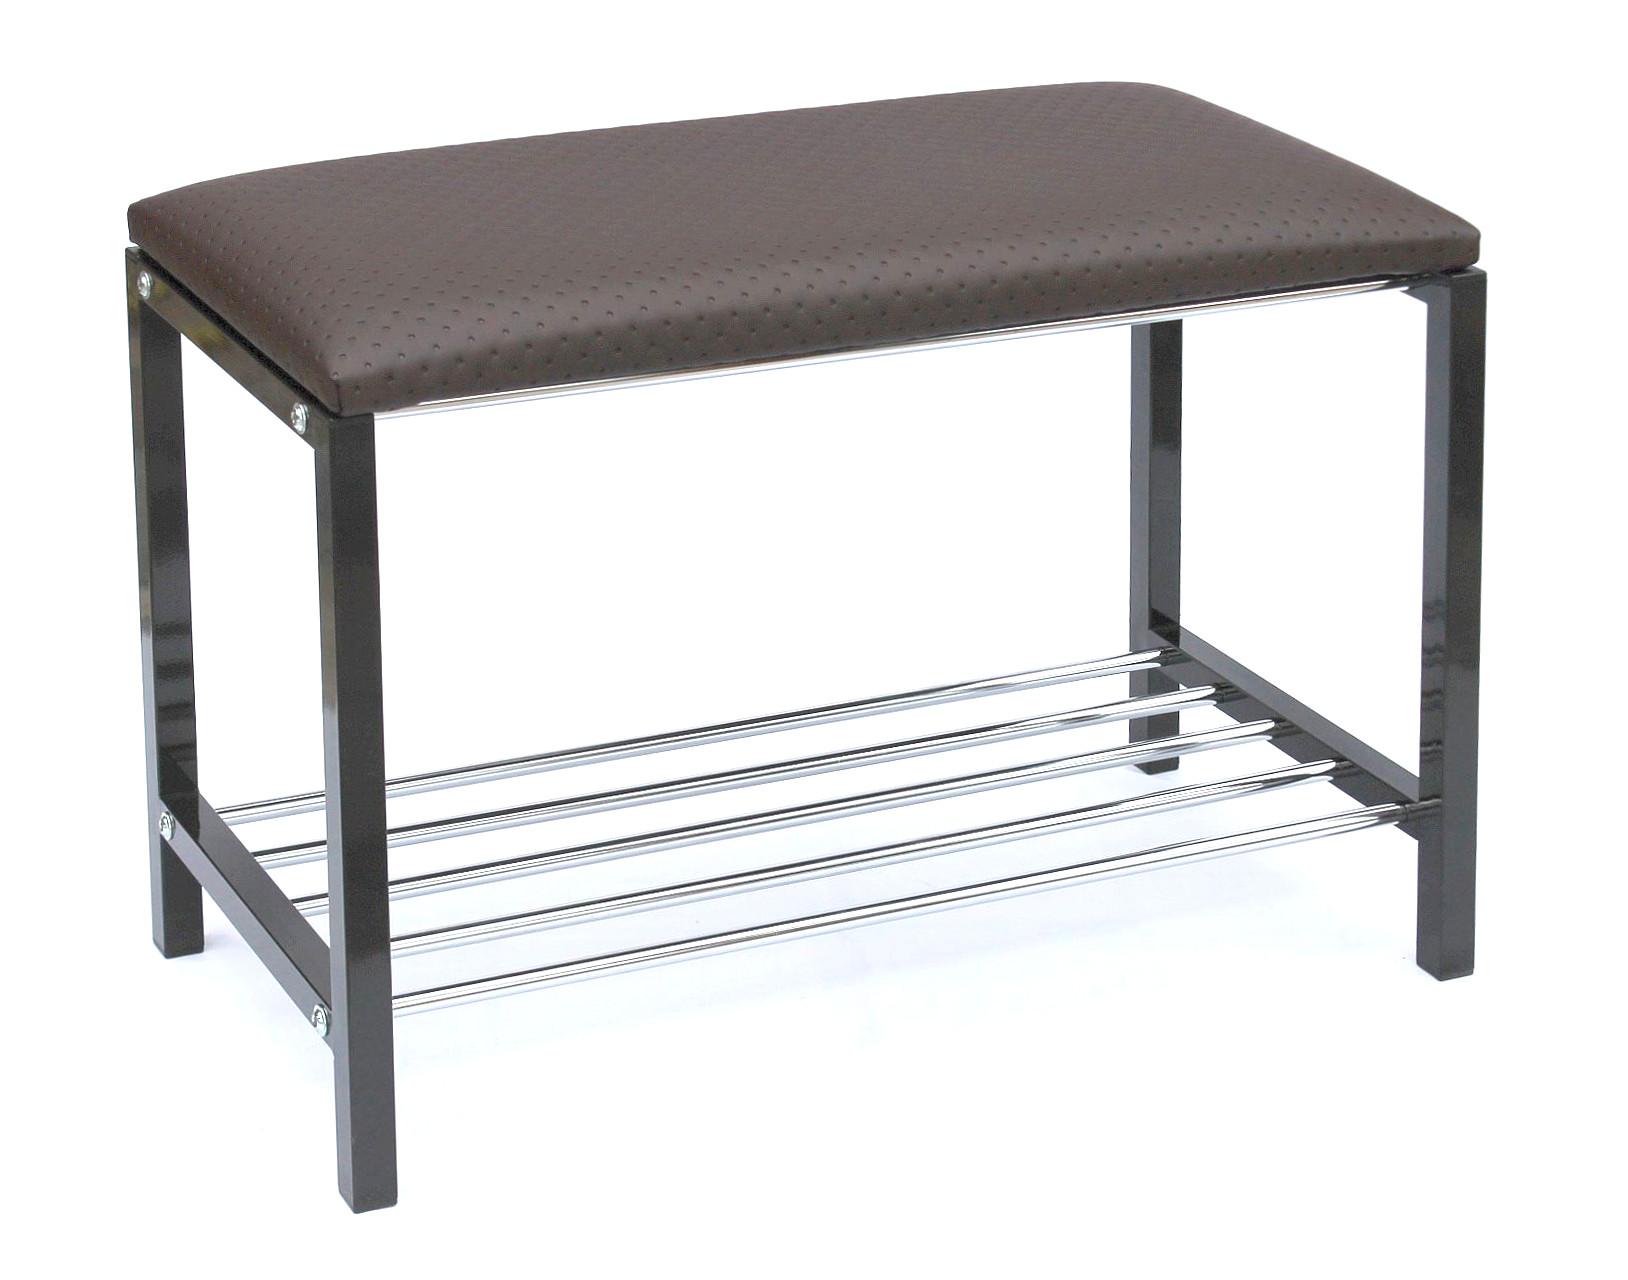 emejing schuhregal mit sitzbank contemporary. Black Bedroom Furniture Sets. Home Design Ideas